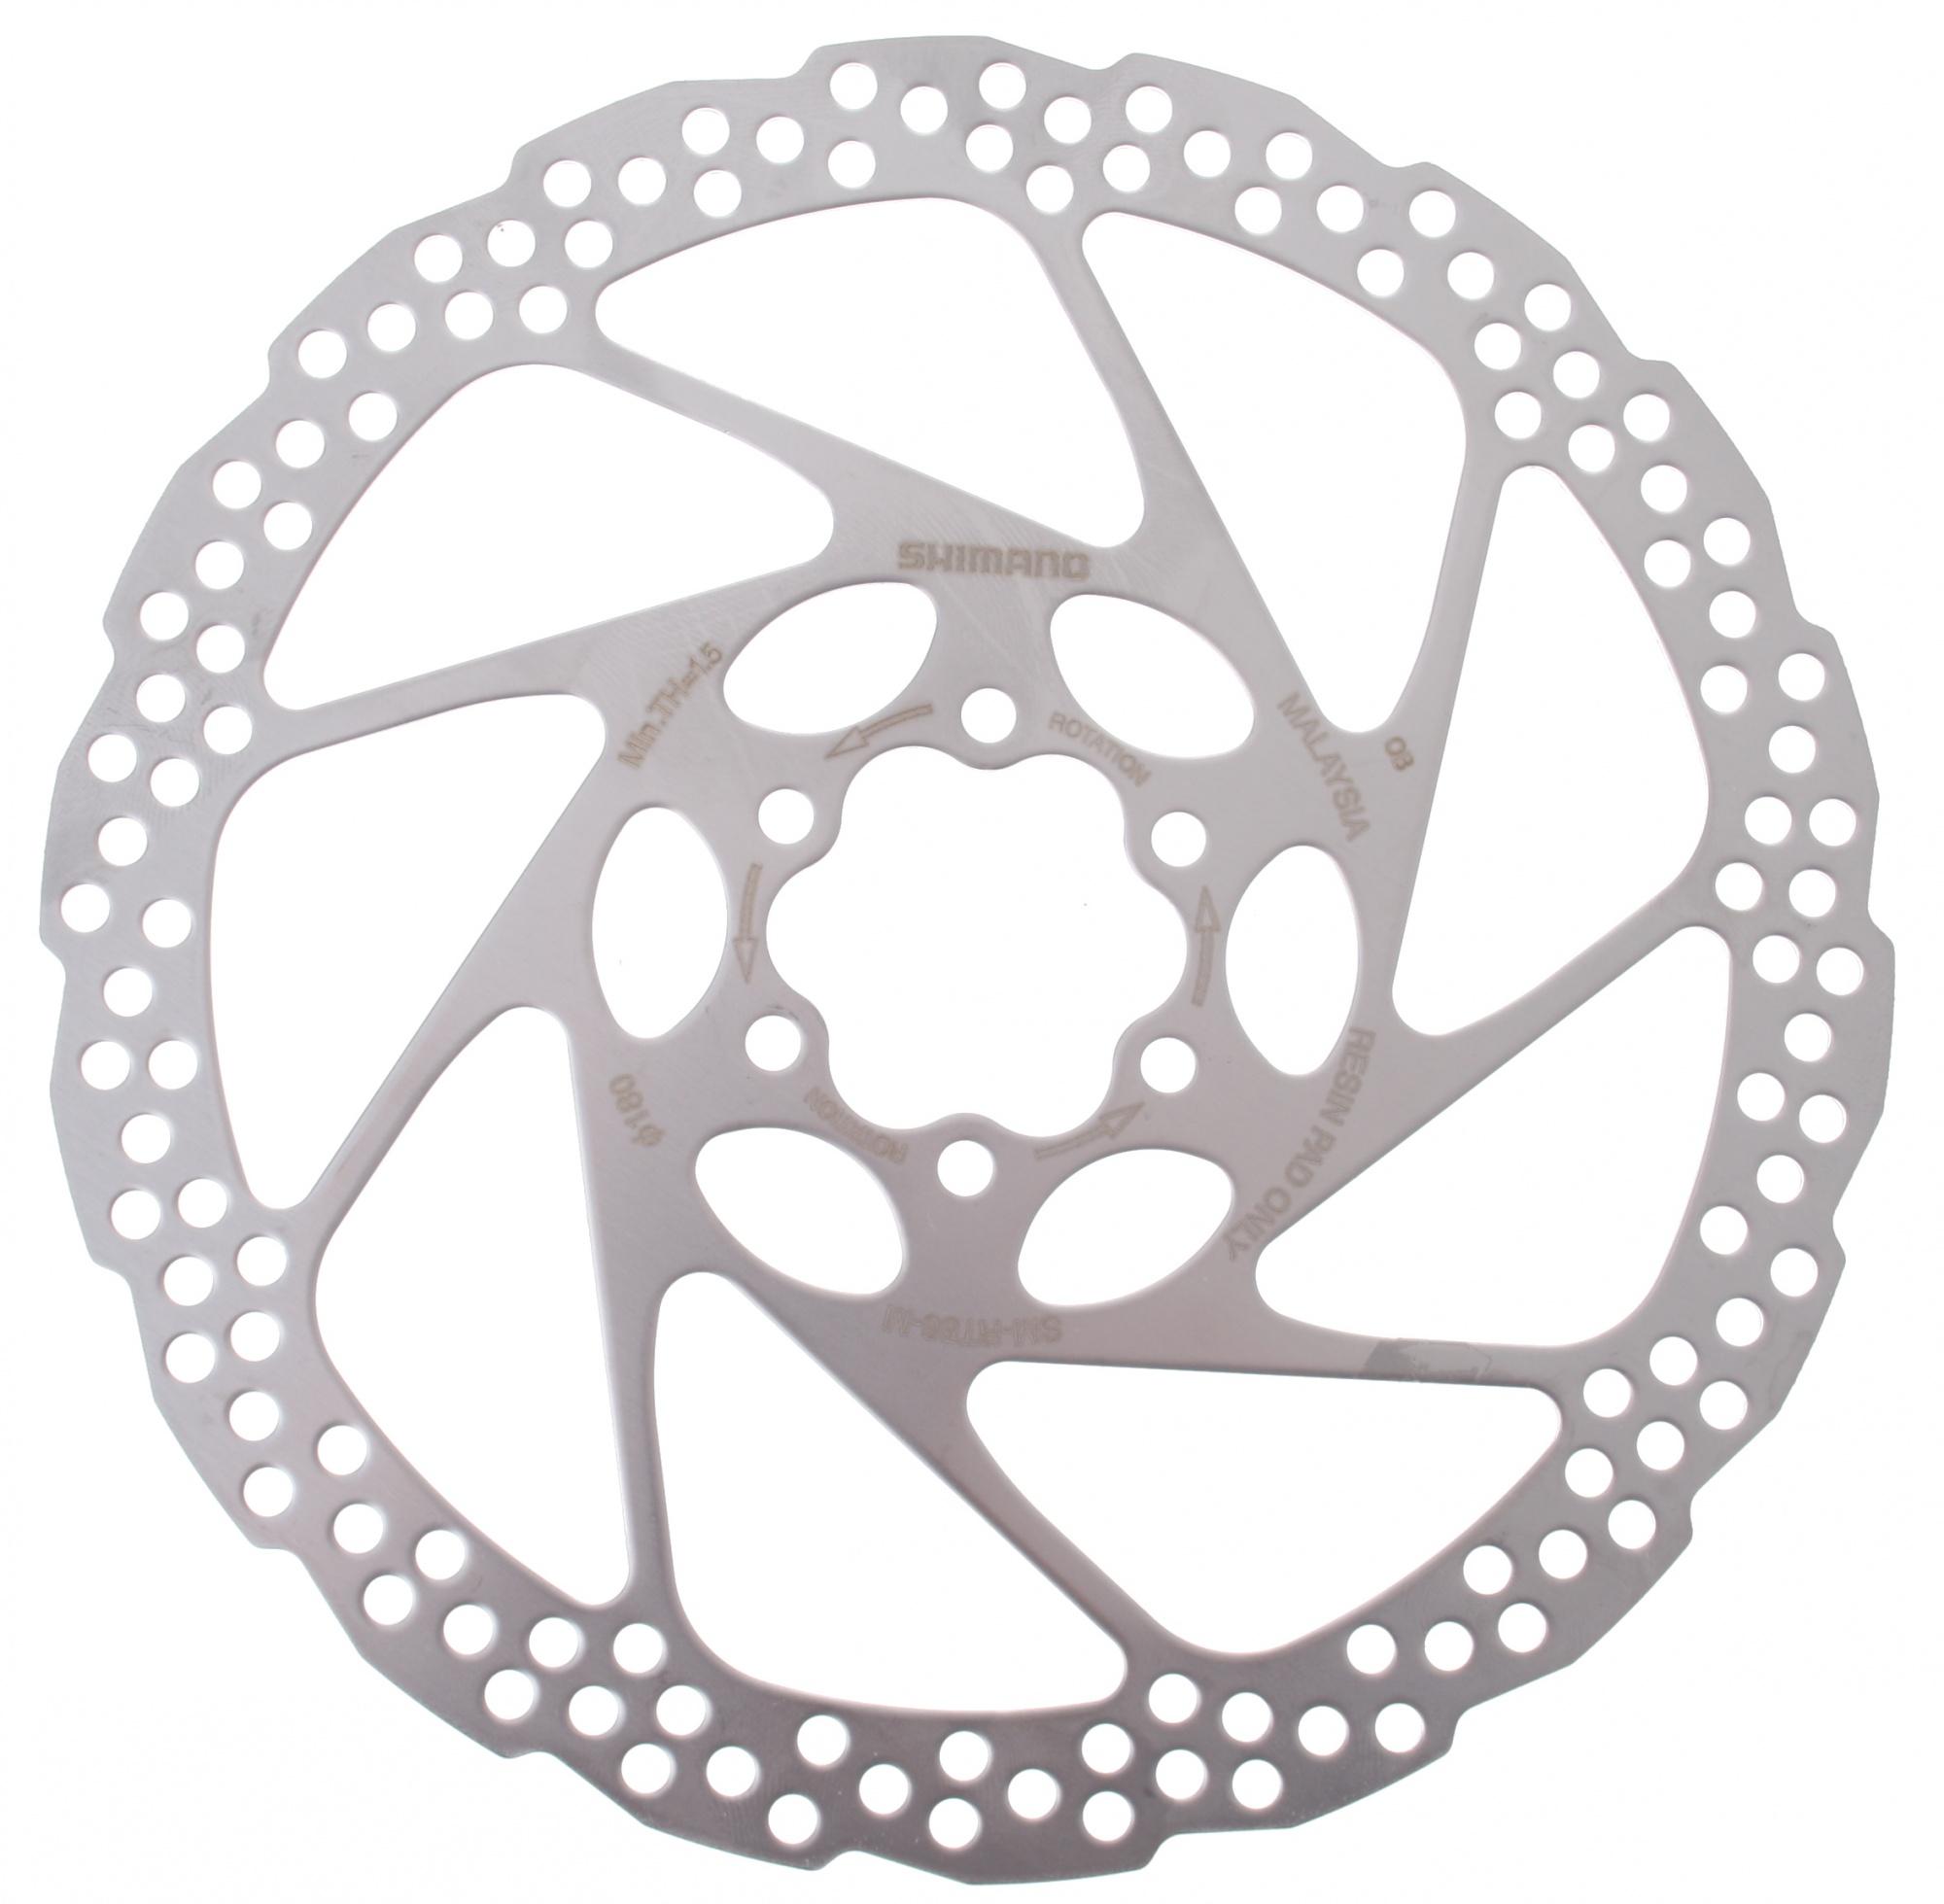 8194ea2d5ce Shimano brake disc SM-RT56 180 mm 6 holes steel silver - Internet-Bikes